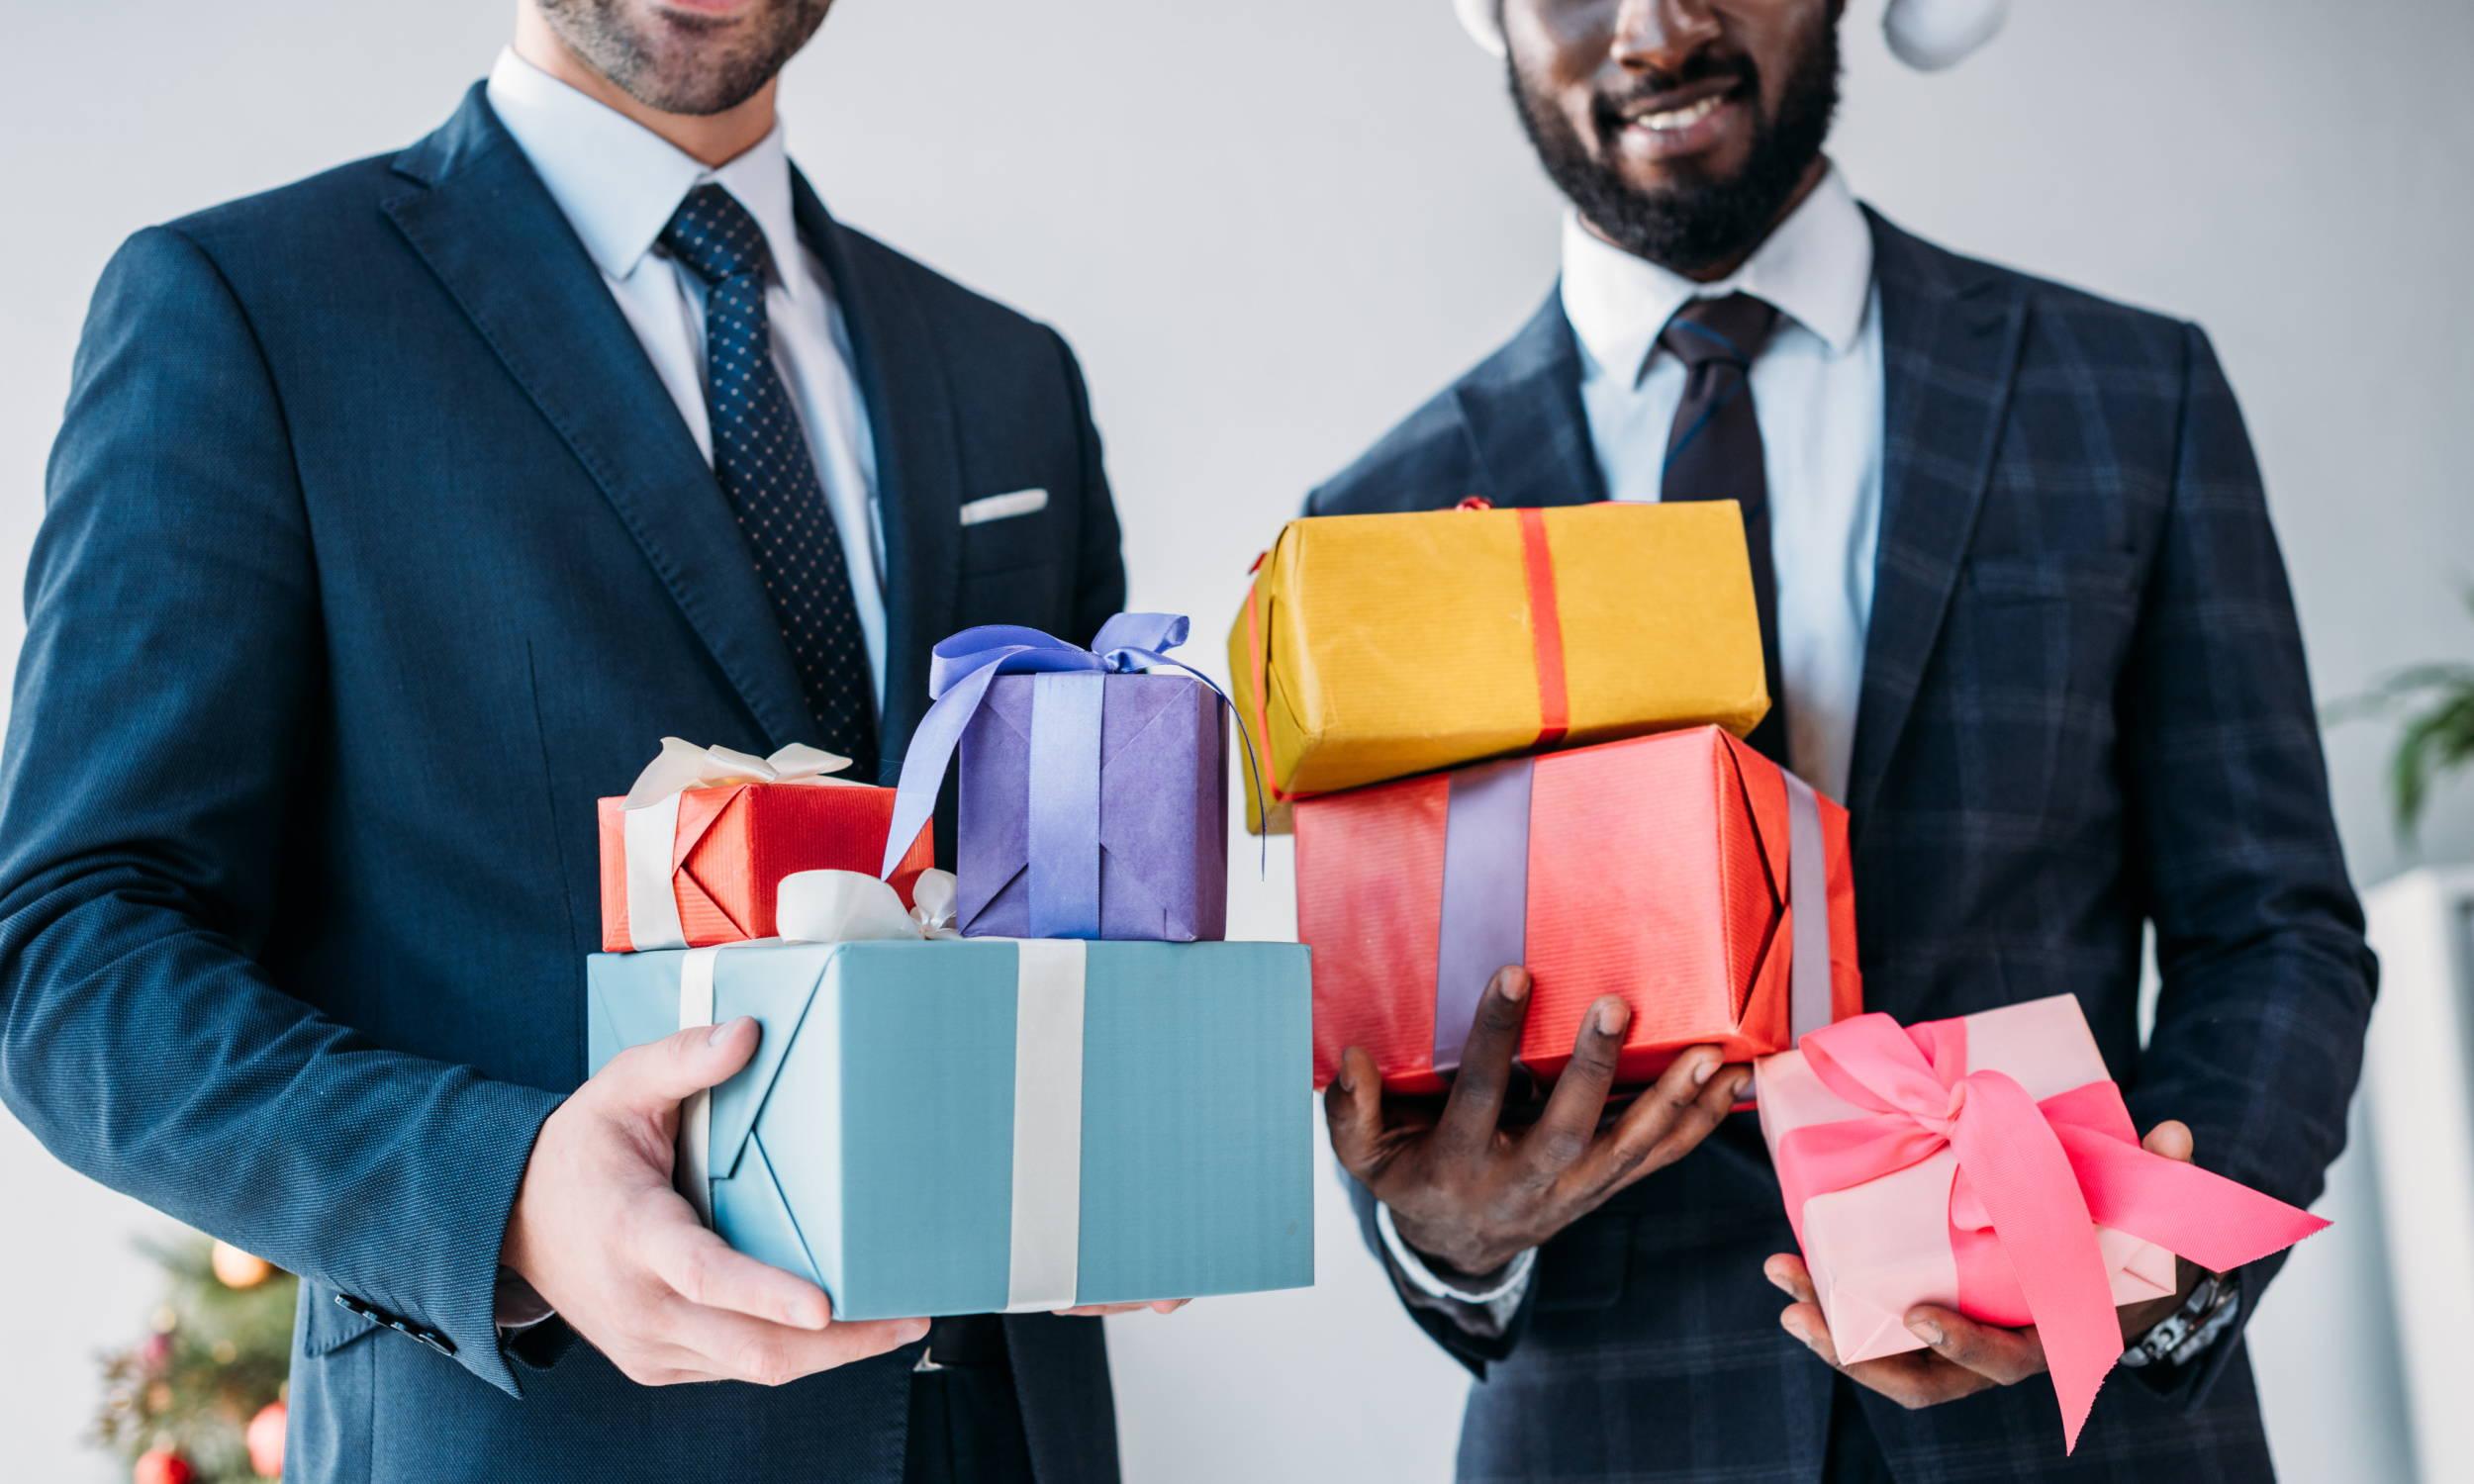 Groomsmen Gifts Guide